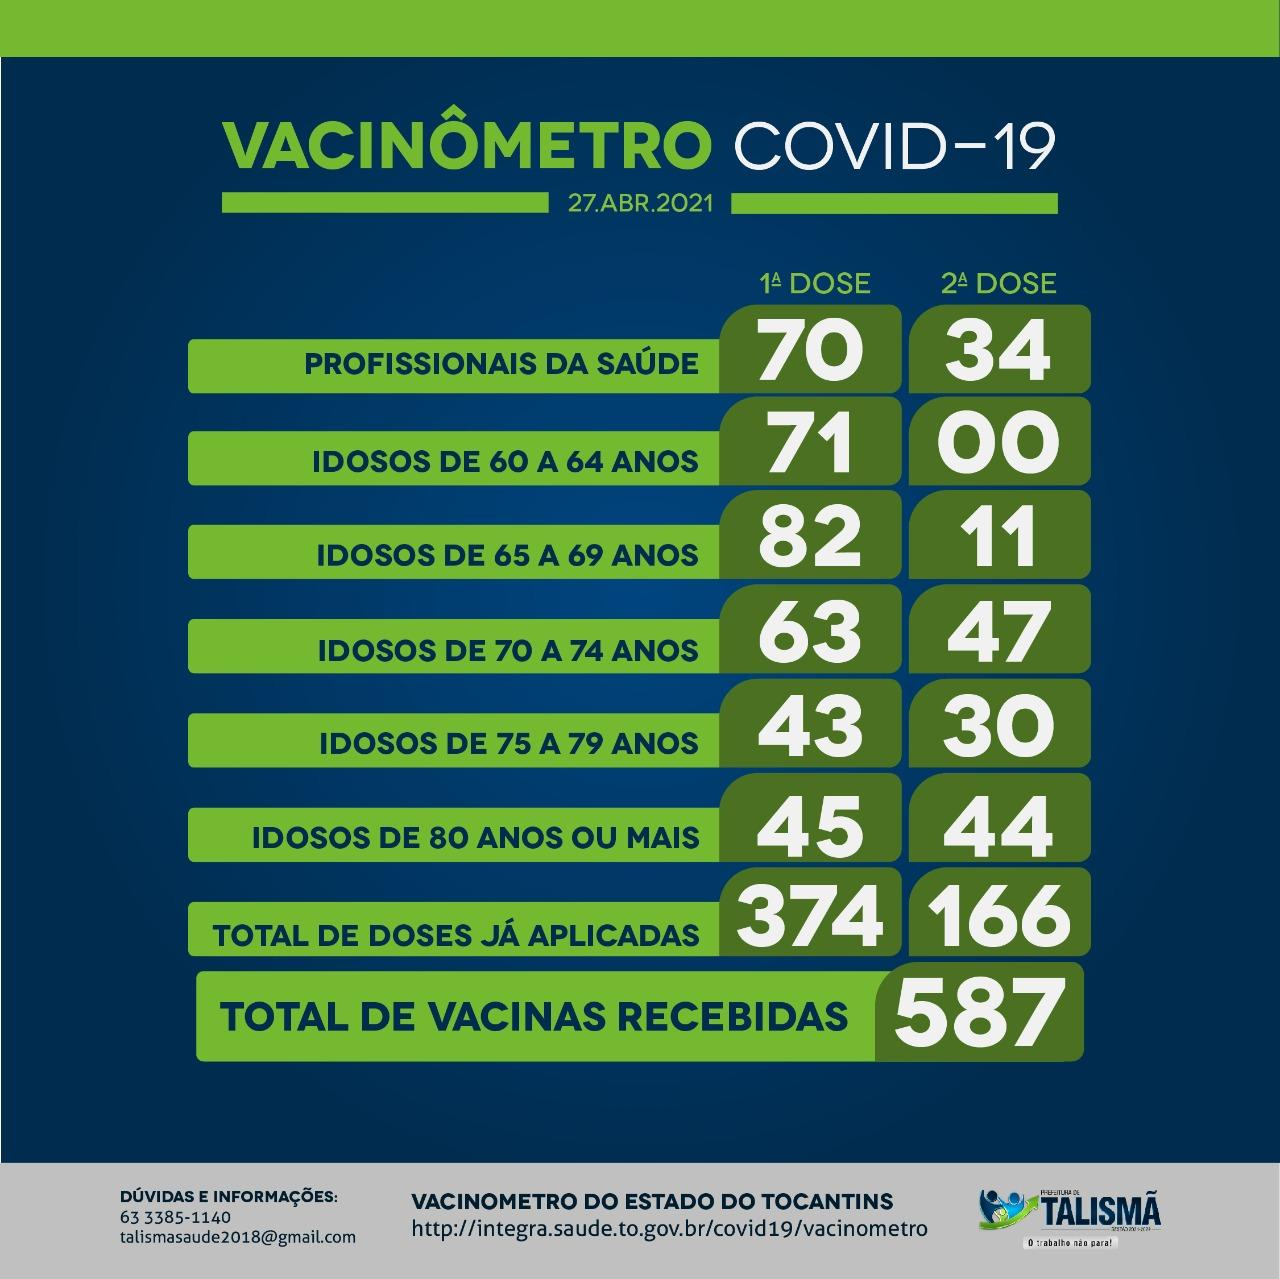 Secretaria de Saúde anuncia aos idosos de 70 a 79 anos para se imunizar com a segunda Dose de vacina contra a Covid-19